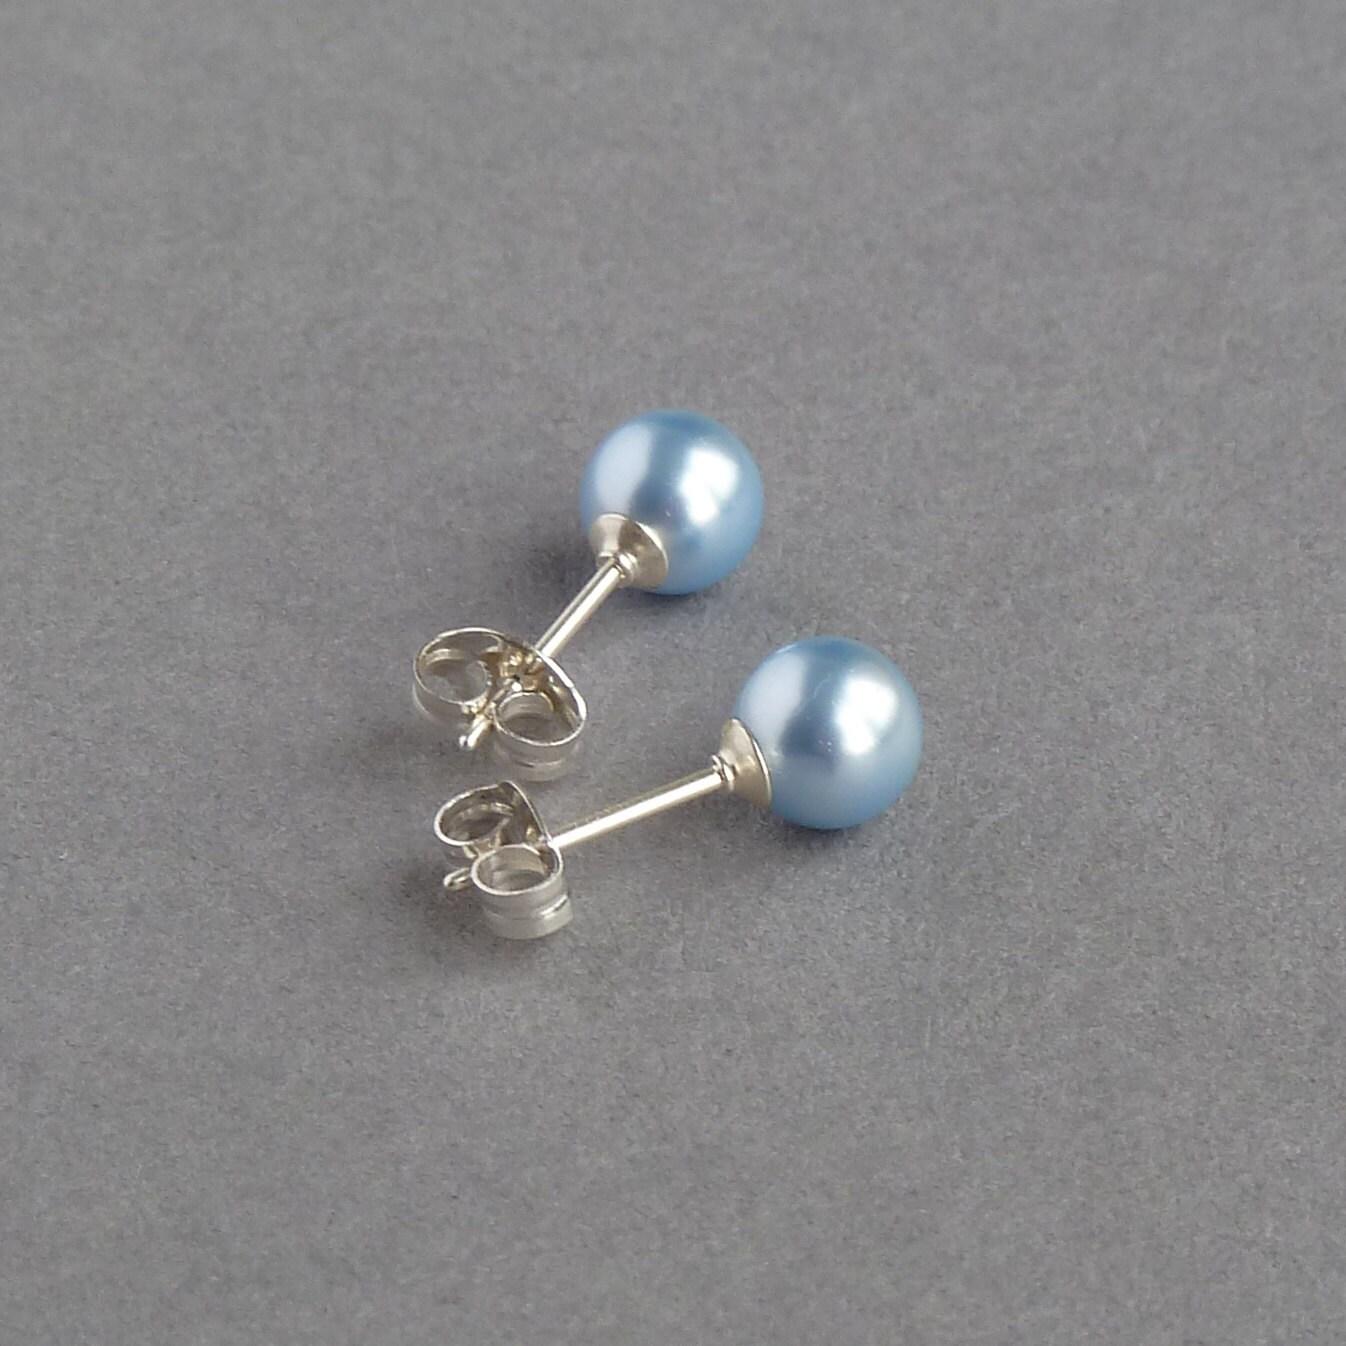 Powder Blue Stud Earrings  Light Blue Swarovski Pearl Earrings  Pale Blue Post Earrings  Bridesmaid Jewellery  Soft Blue Wedding Gifts